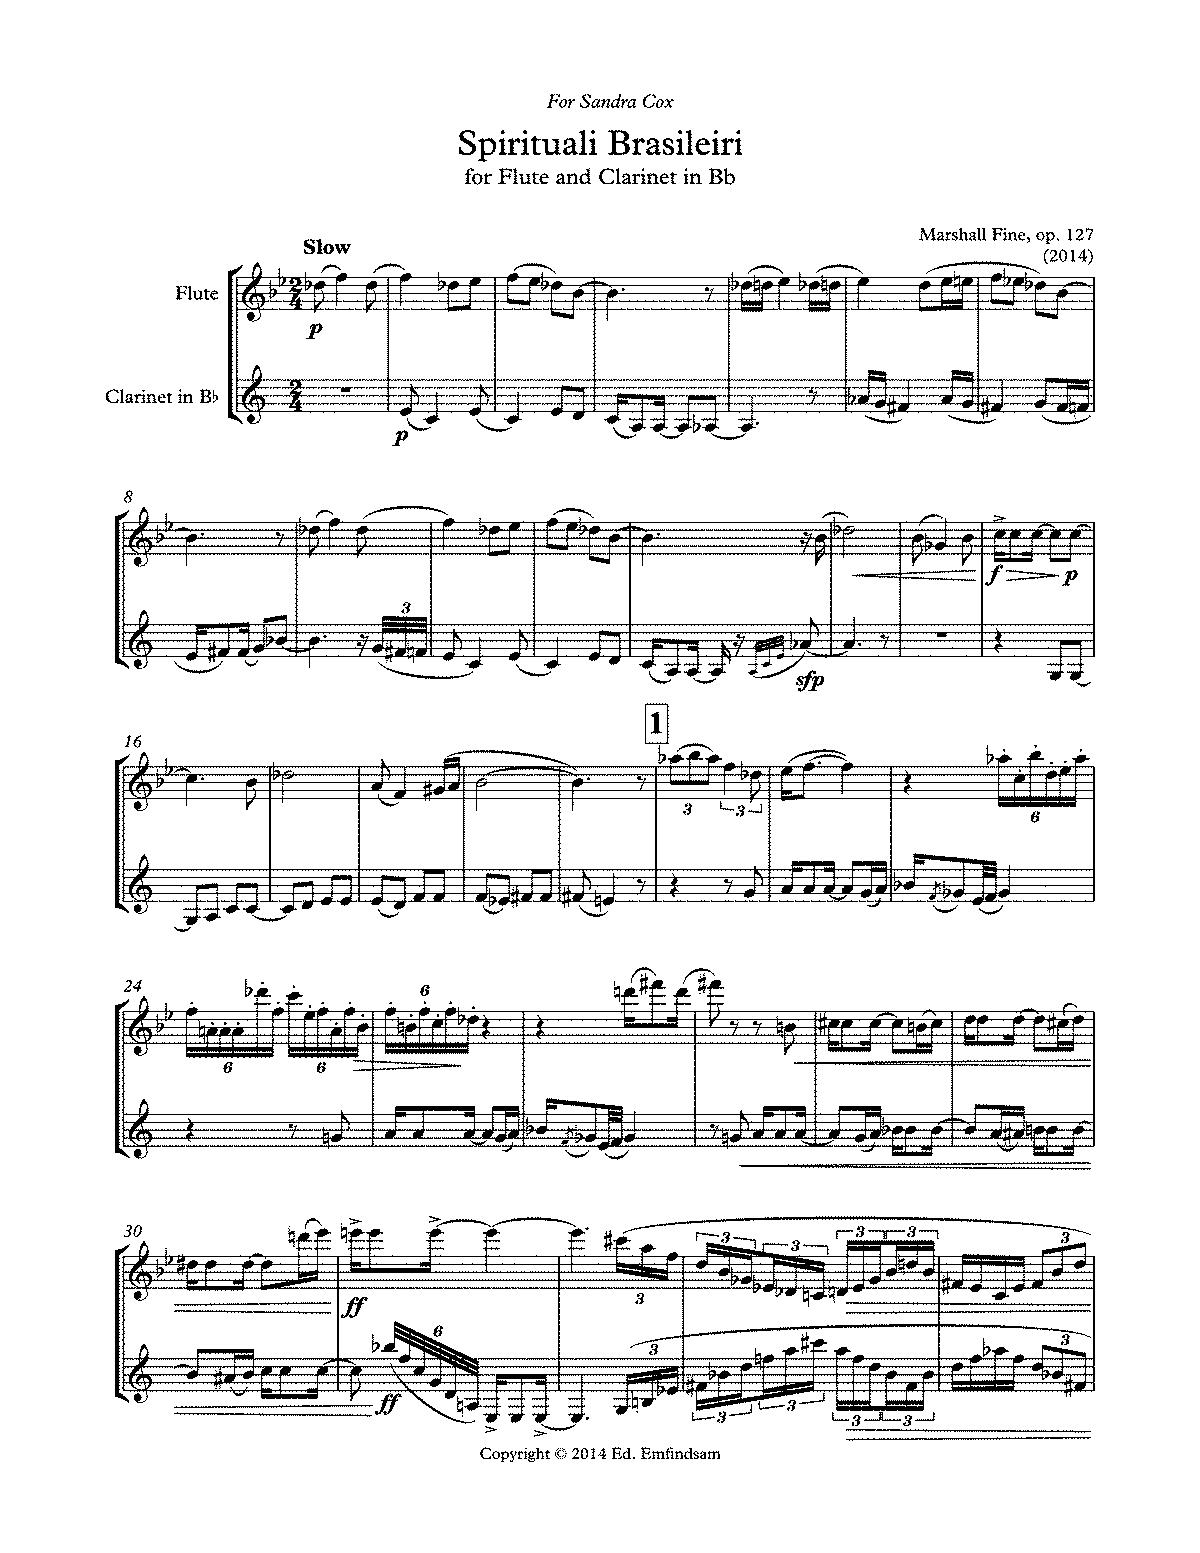 PmlpSpirituali Brasilieri  Score And PartsPdf  Chamber